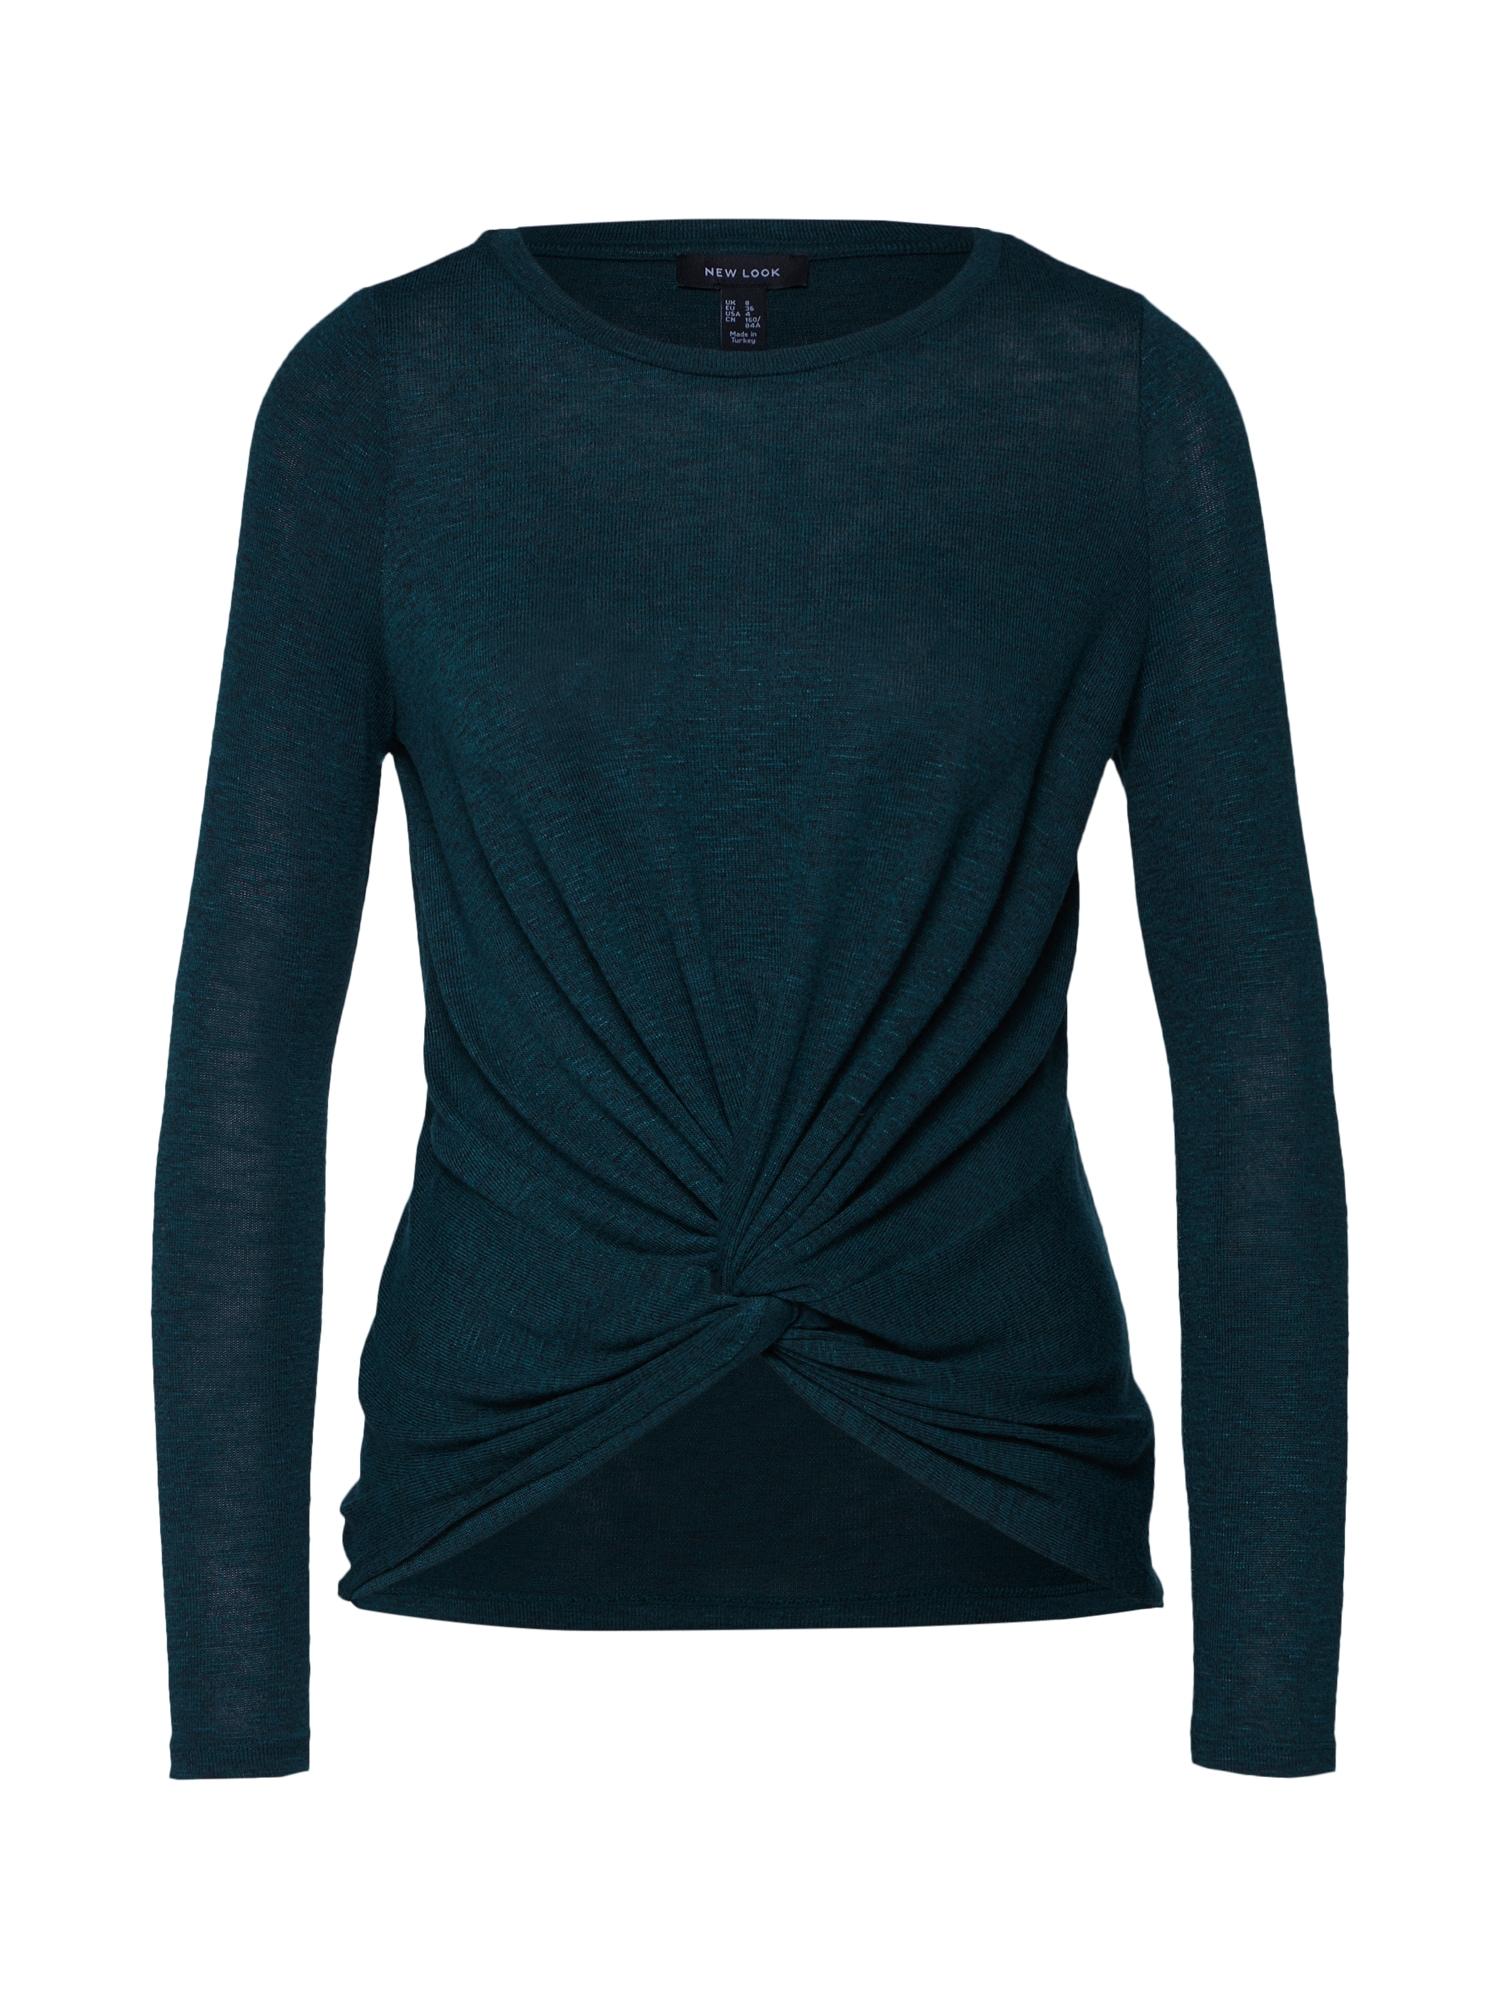 Tričko TWIST tmavě zelená NEW LOOK